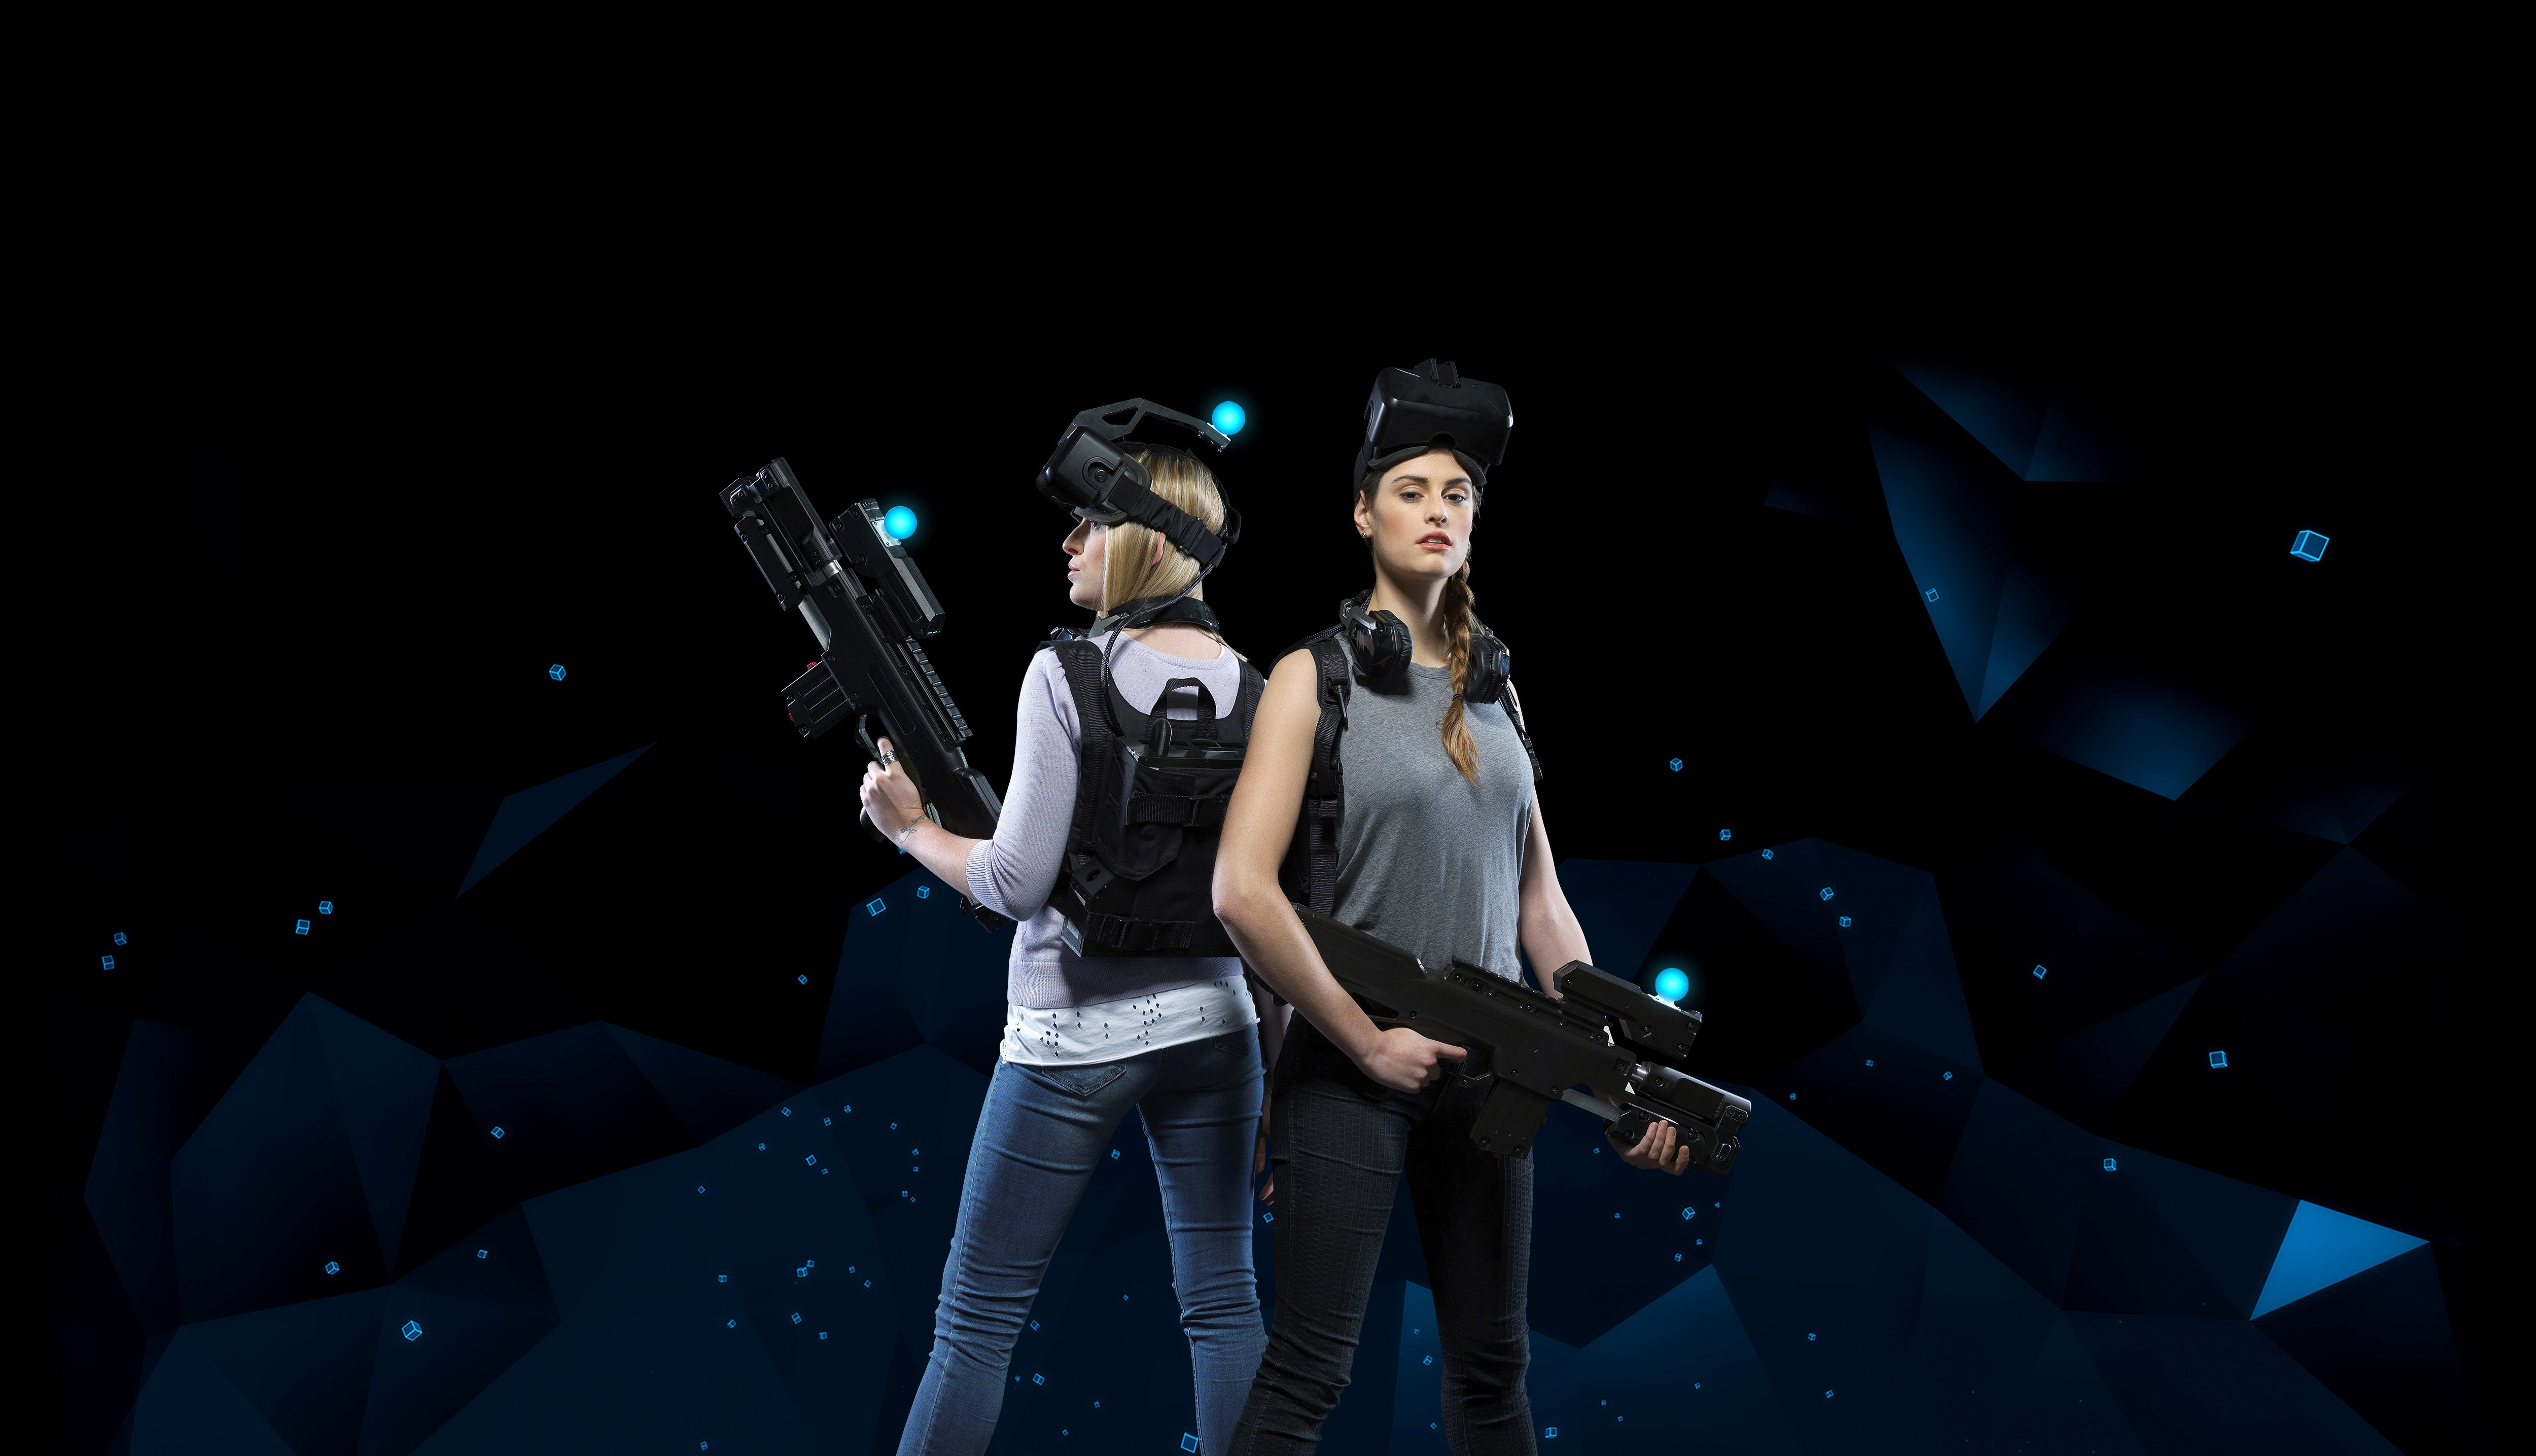 Main Event V Play Virtual Reality game